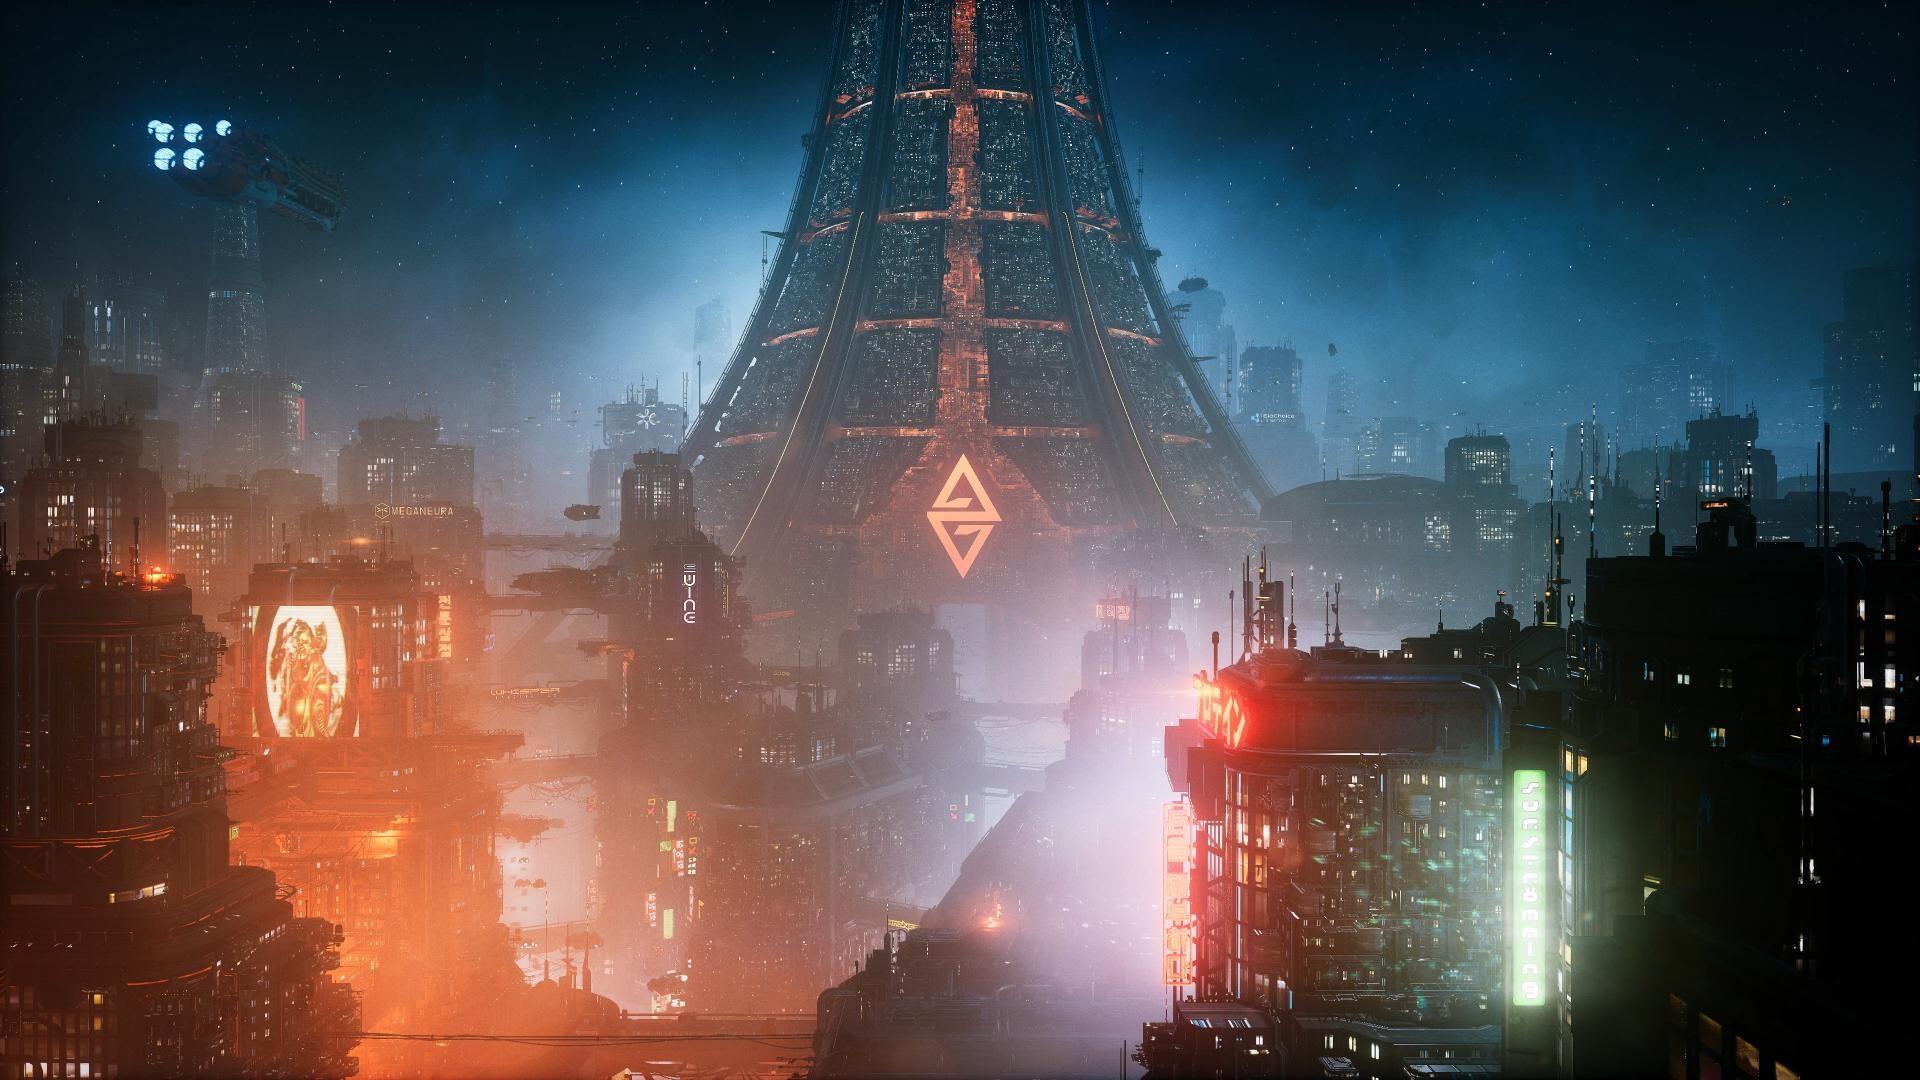 Die Metropole der Ascent Group im Spiel The Ascent.